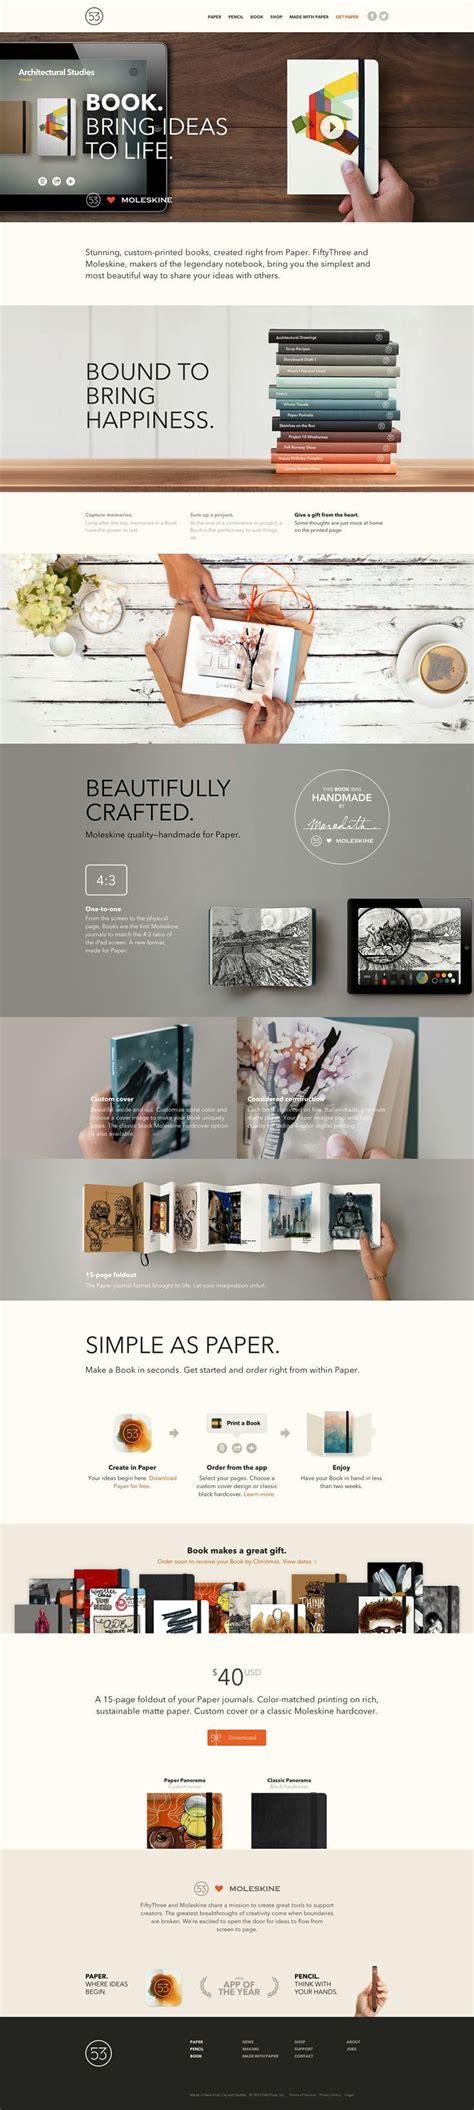 web layout design books 33 best vector images on pinterest hangers coat hanger